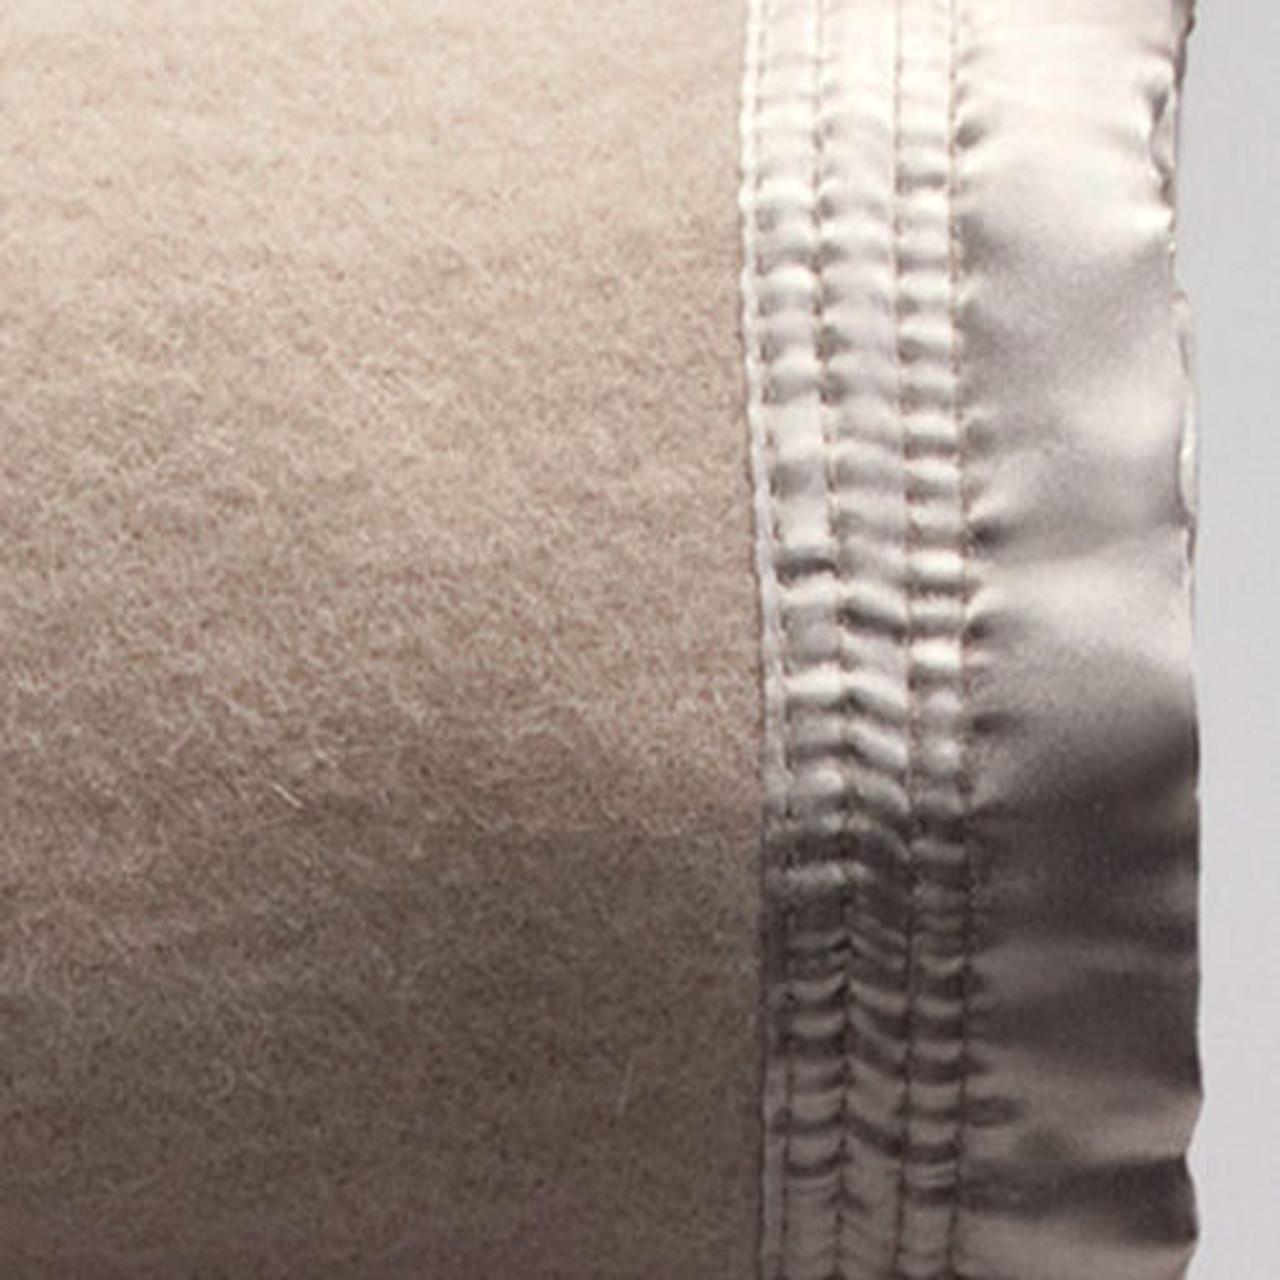 Queen Cot King Single Double Bianca Australian Wool Blanket Super King King